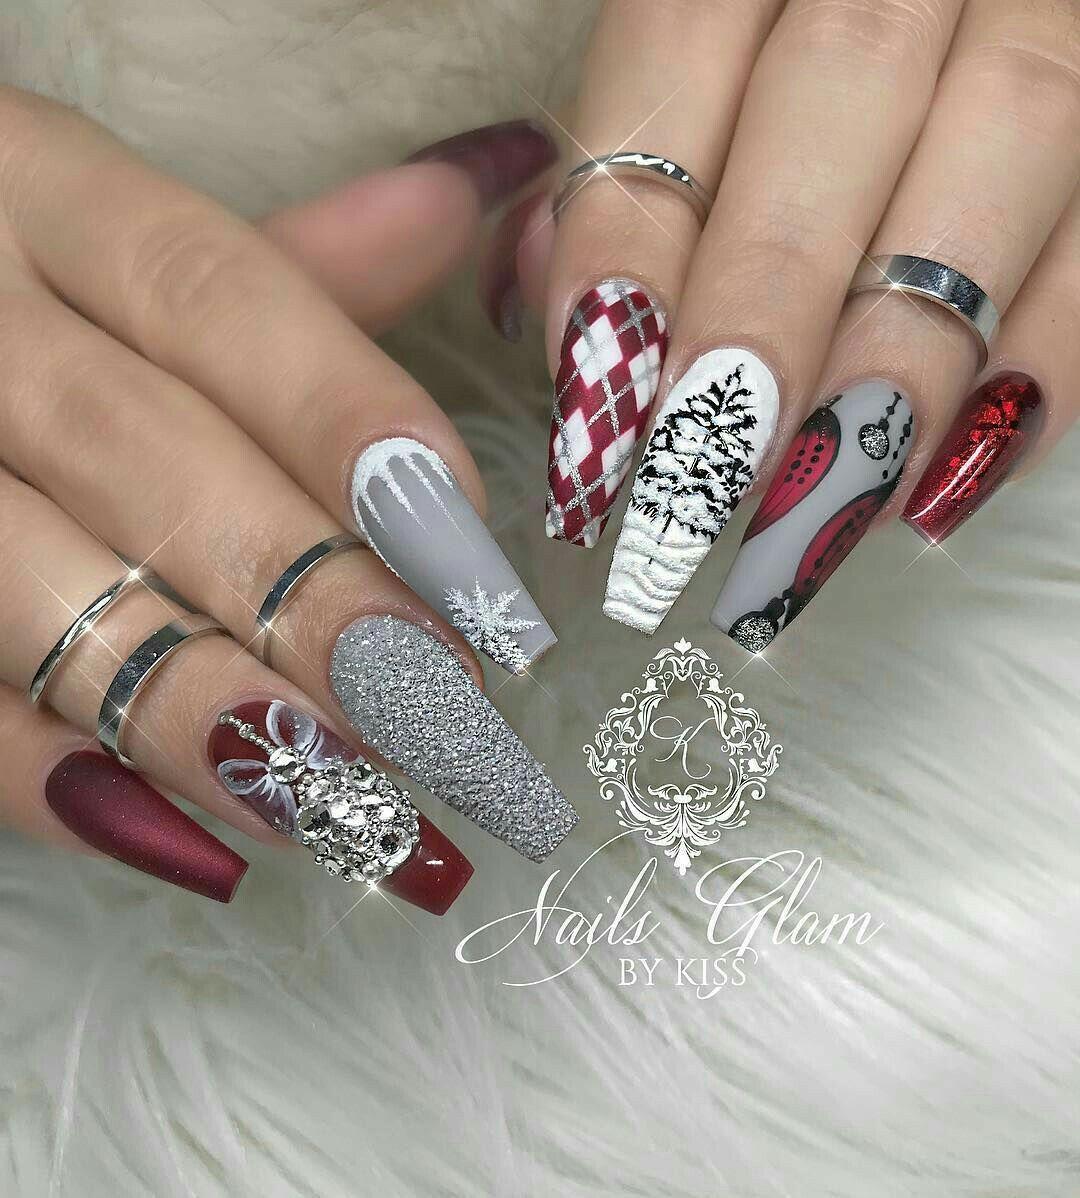 50 Beautiful Stylish And Trendy Nail Art Designs For Christmas Xmas Nails Christmas Nails Coffin Nails Designs